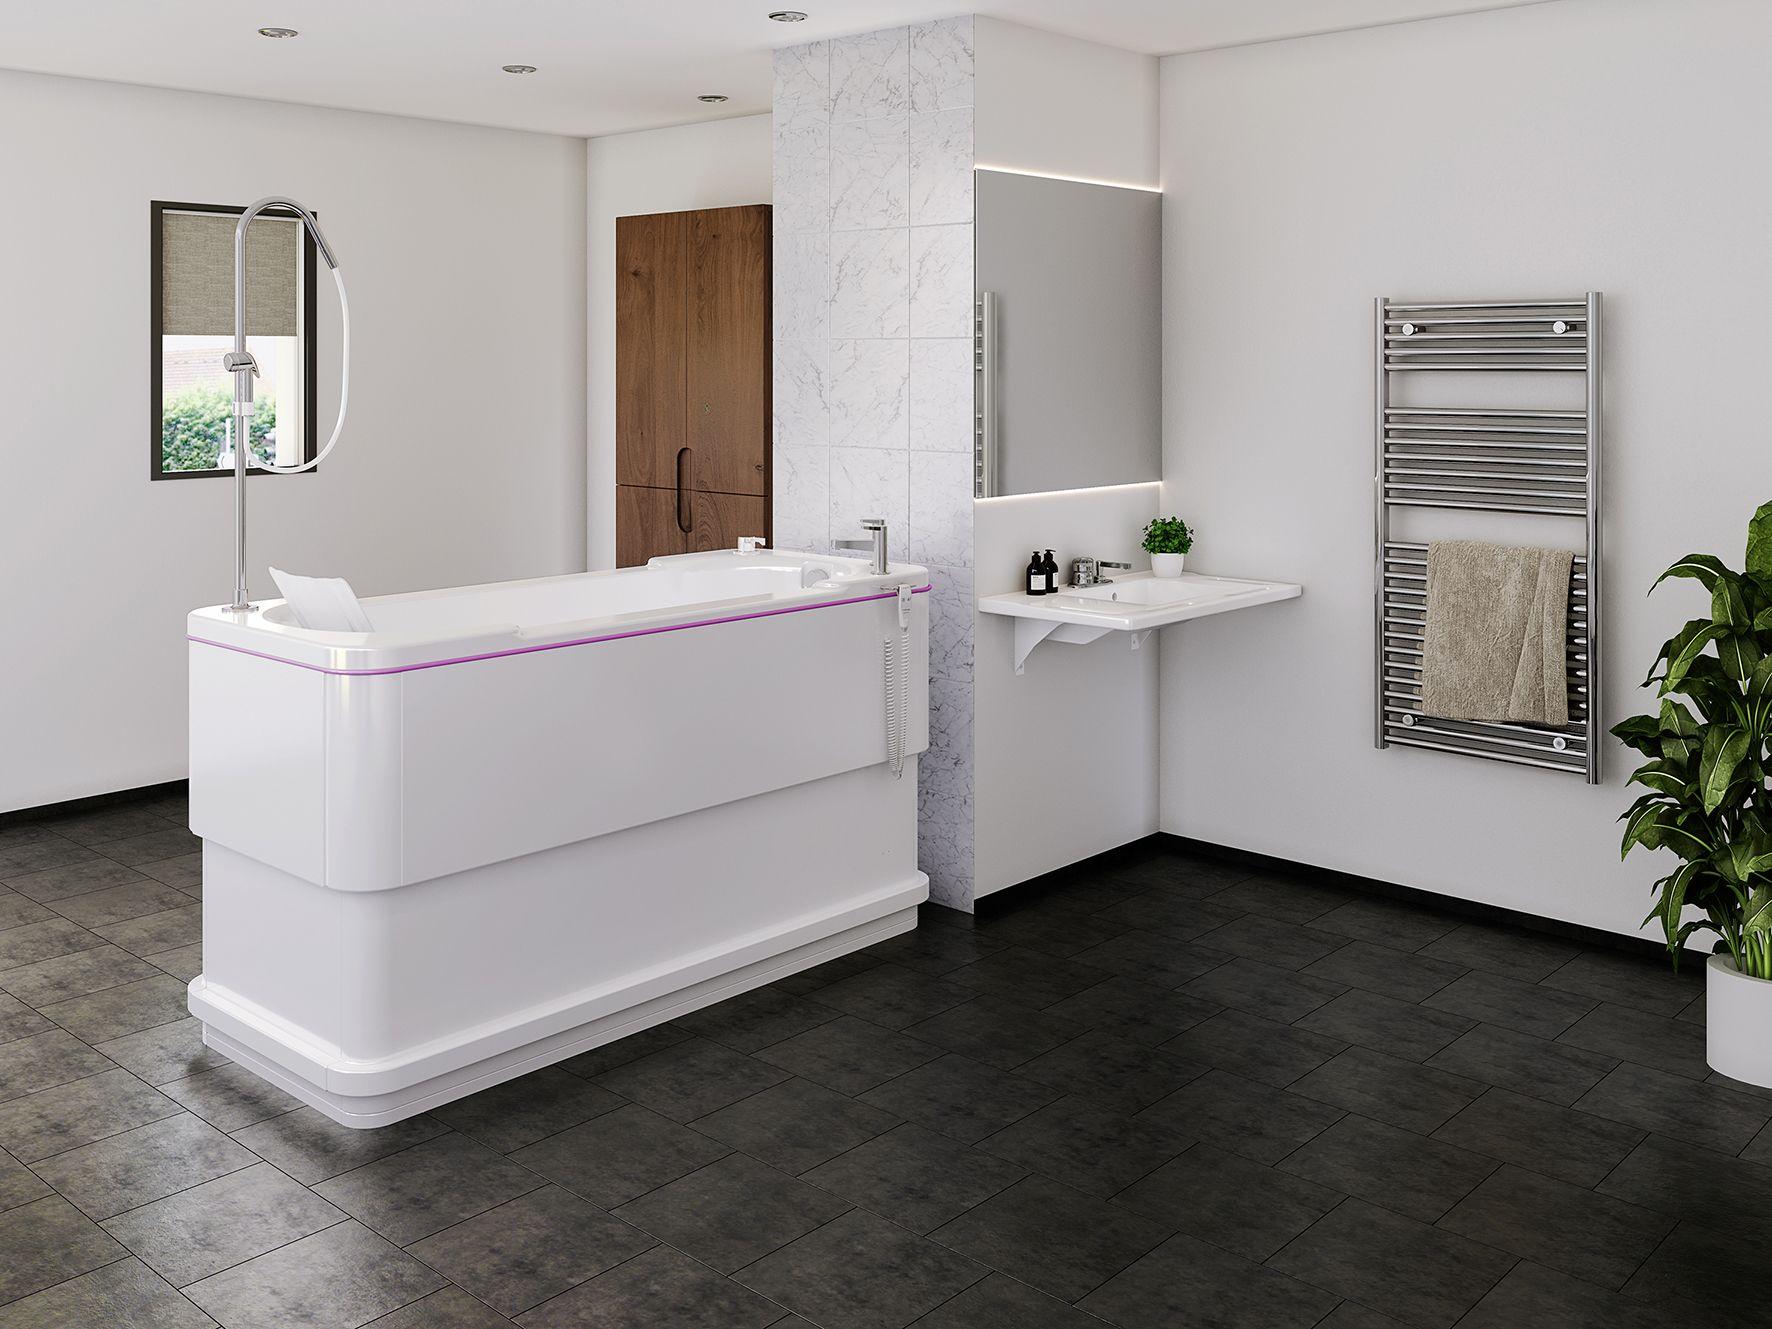 Gainsborough launches specialist Oraya platform bath for advanced spinal stability